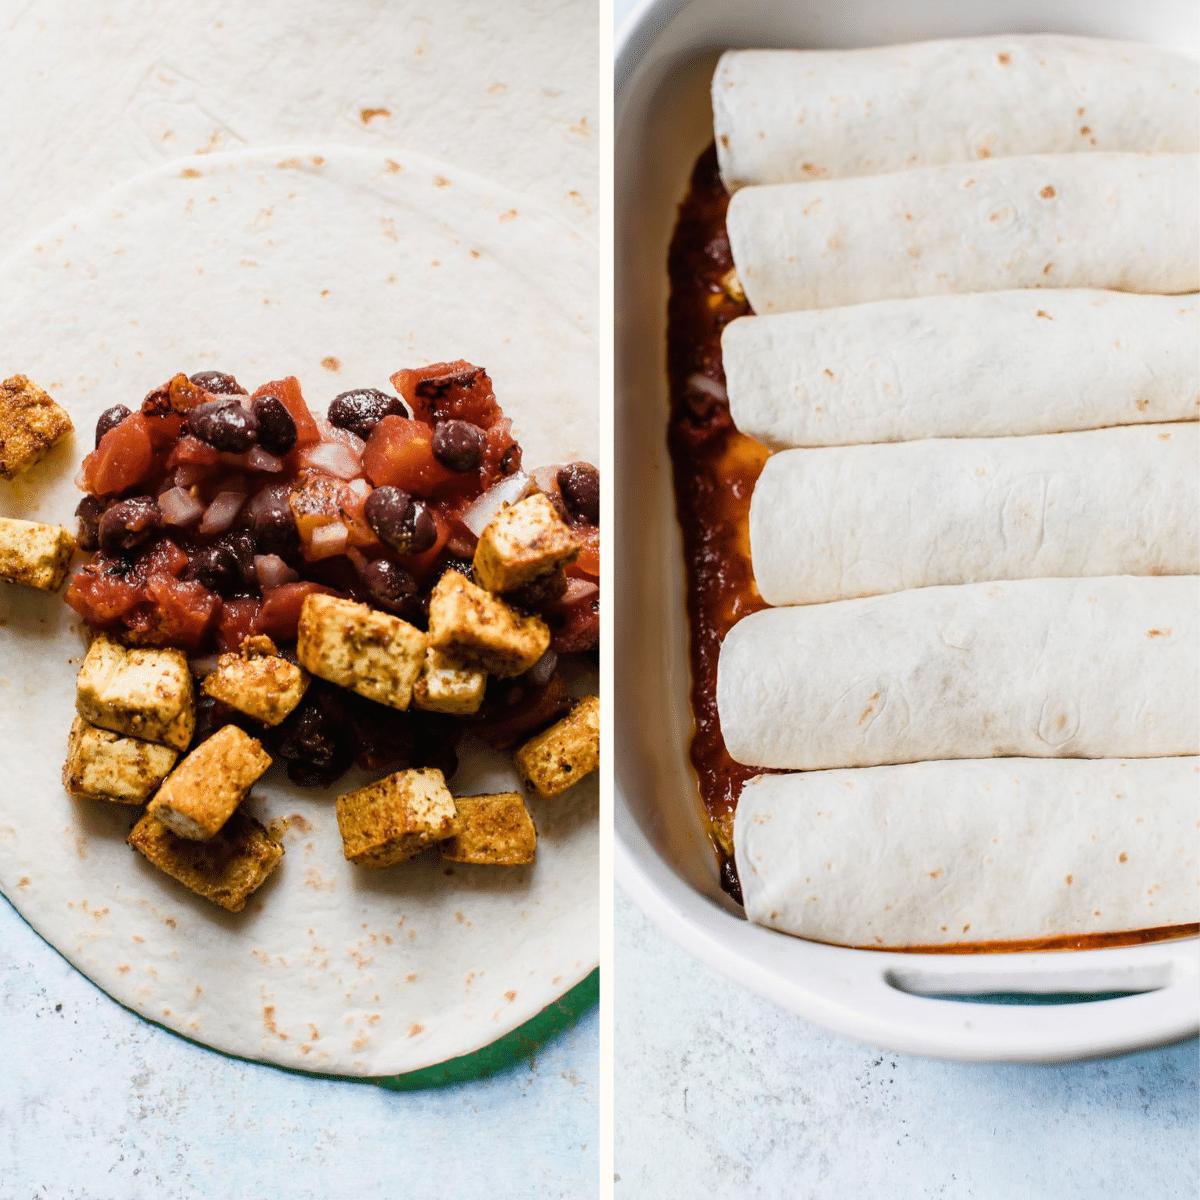 assembled enchiladas in a casserole dish